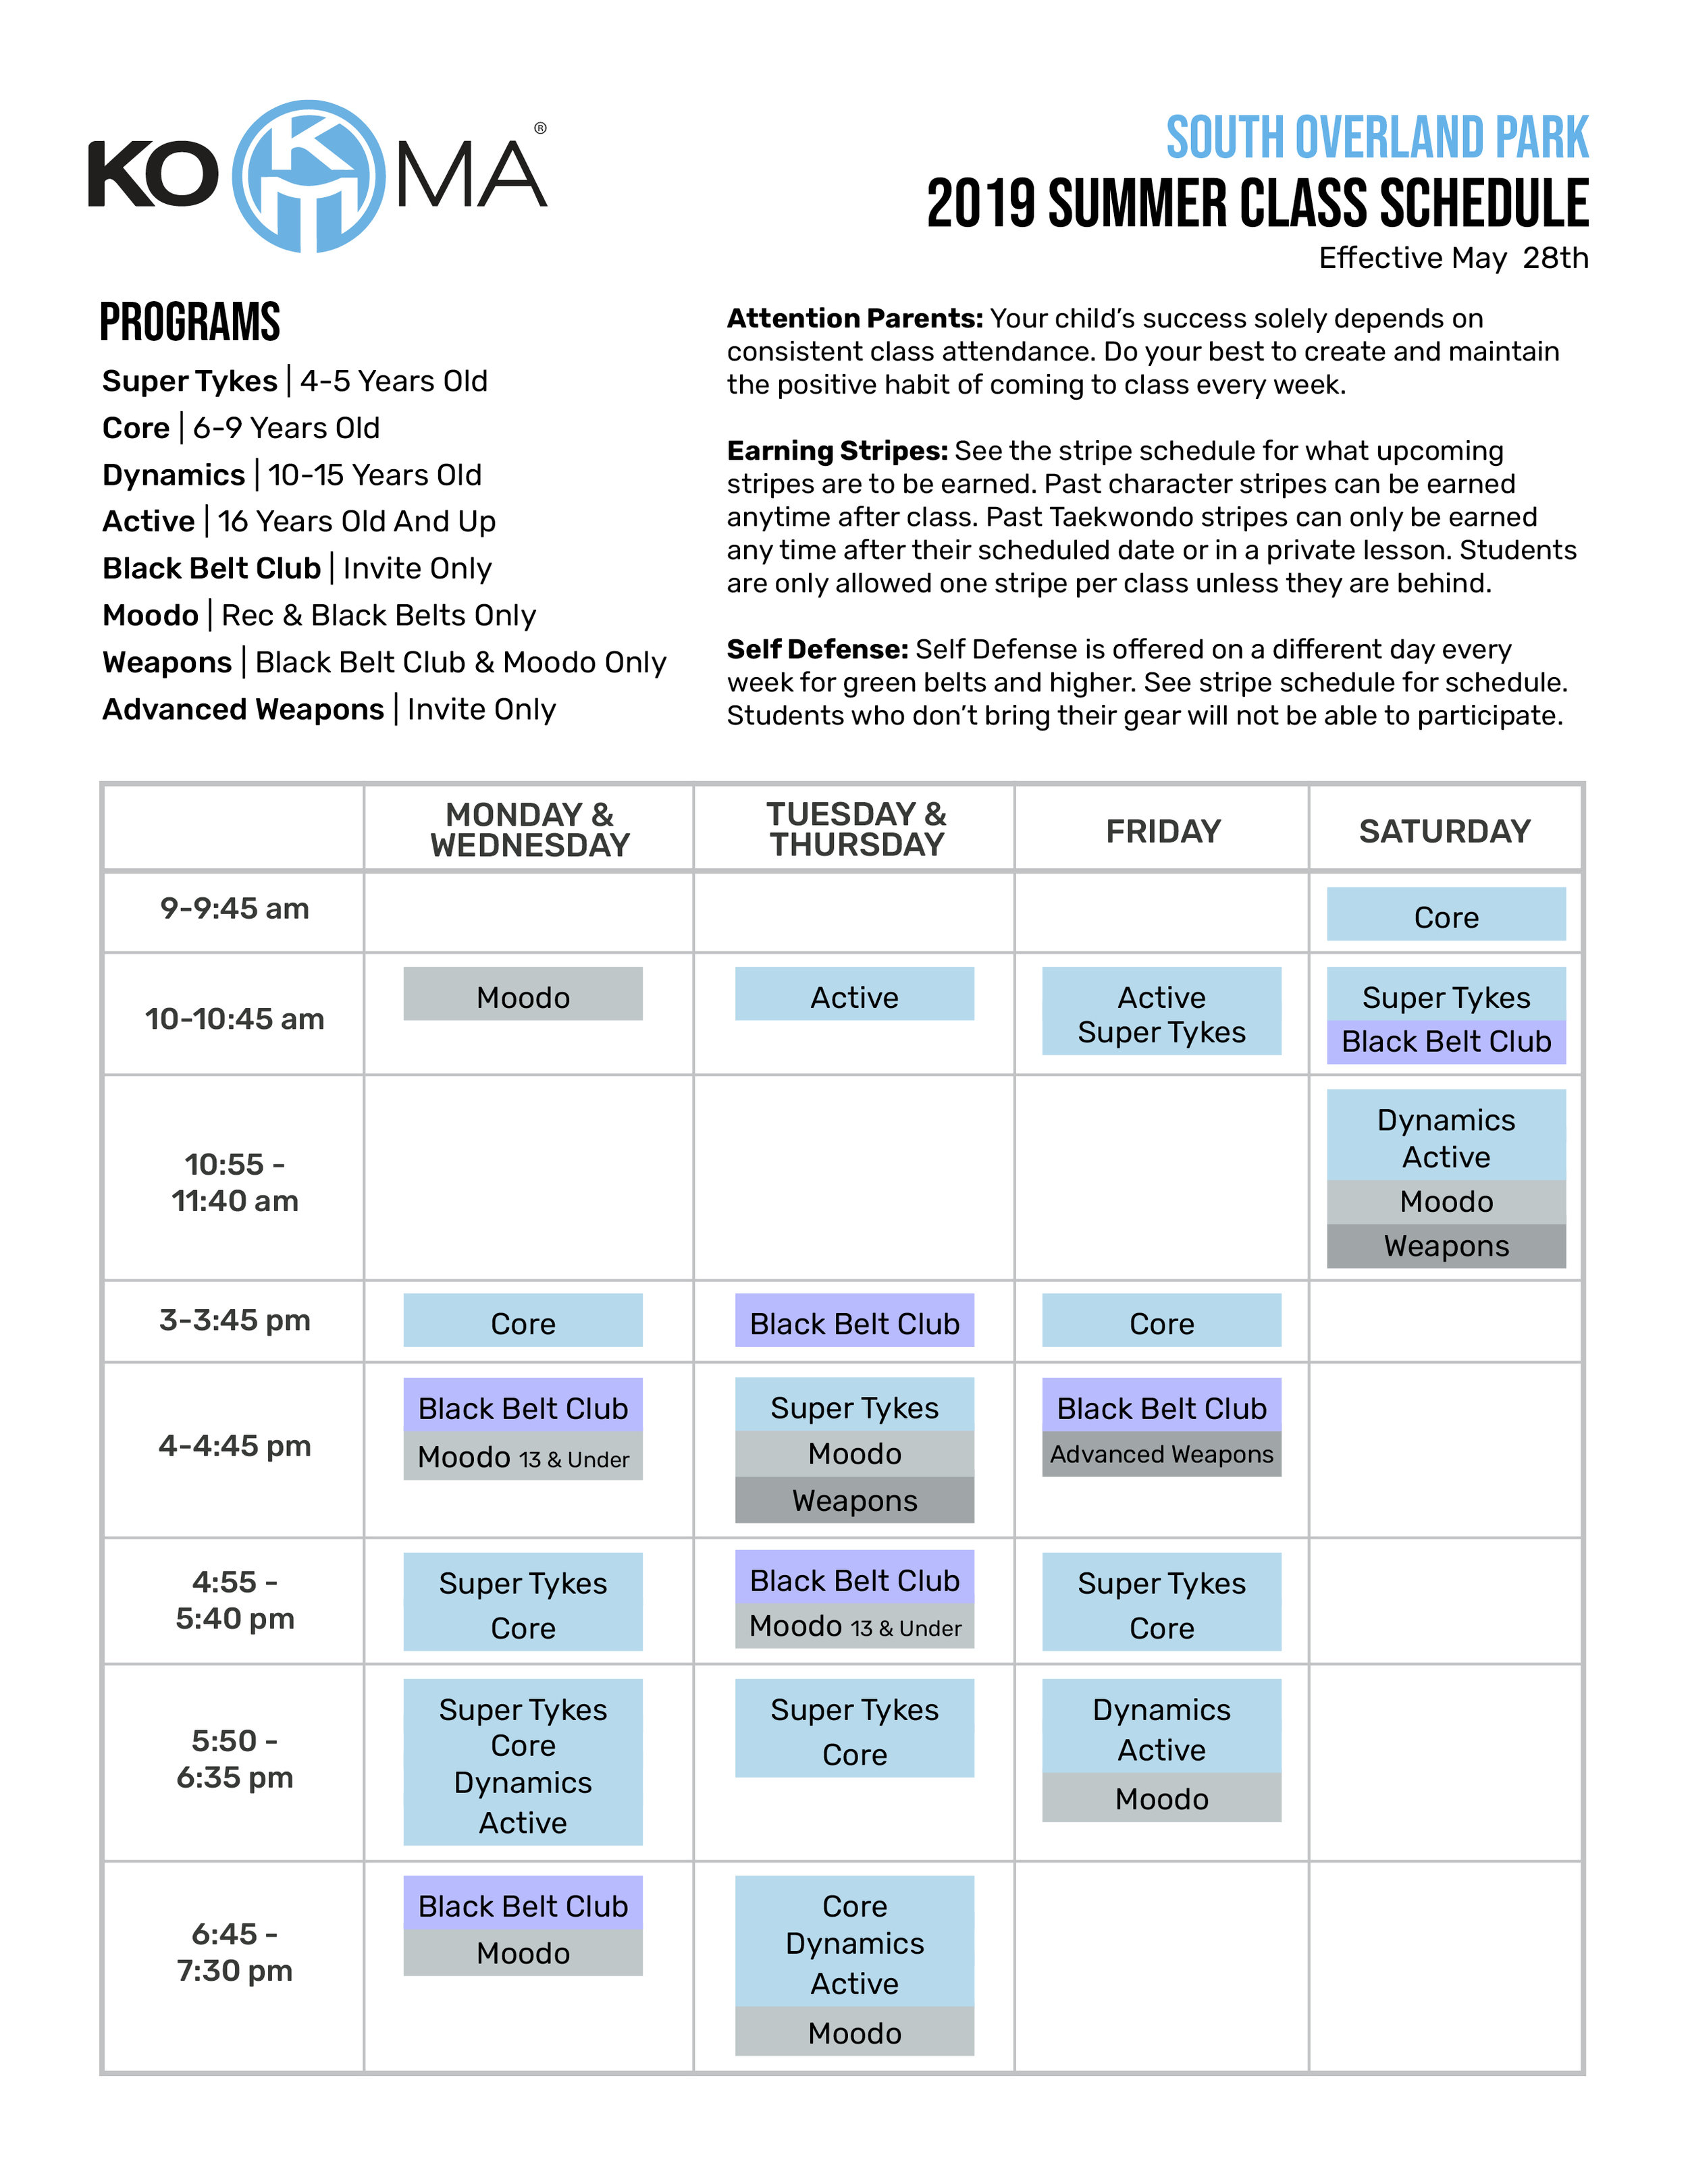 SOP Summer Schedule 2019.jpg